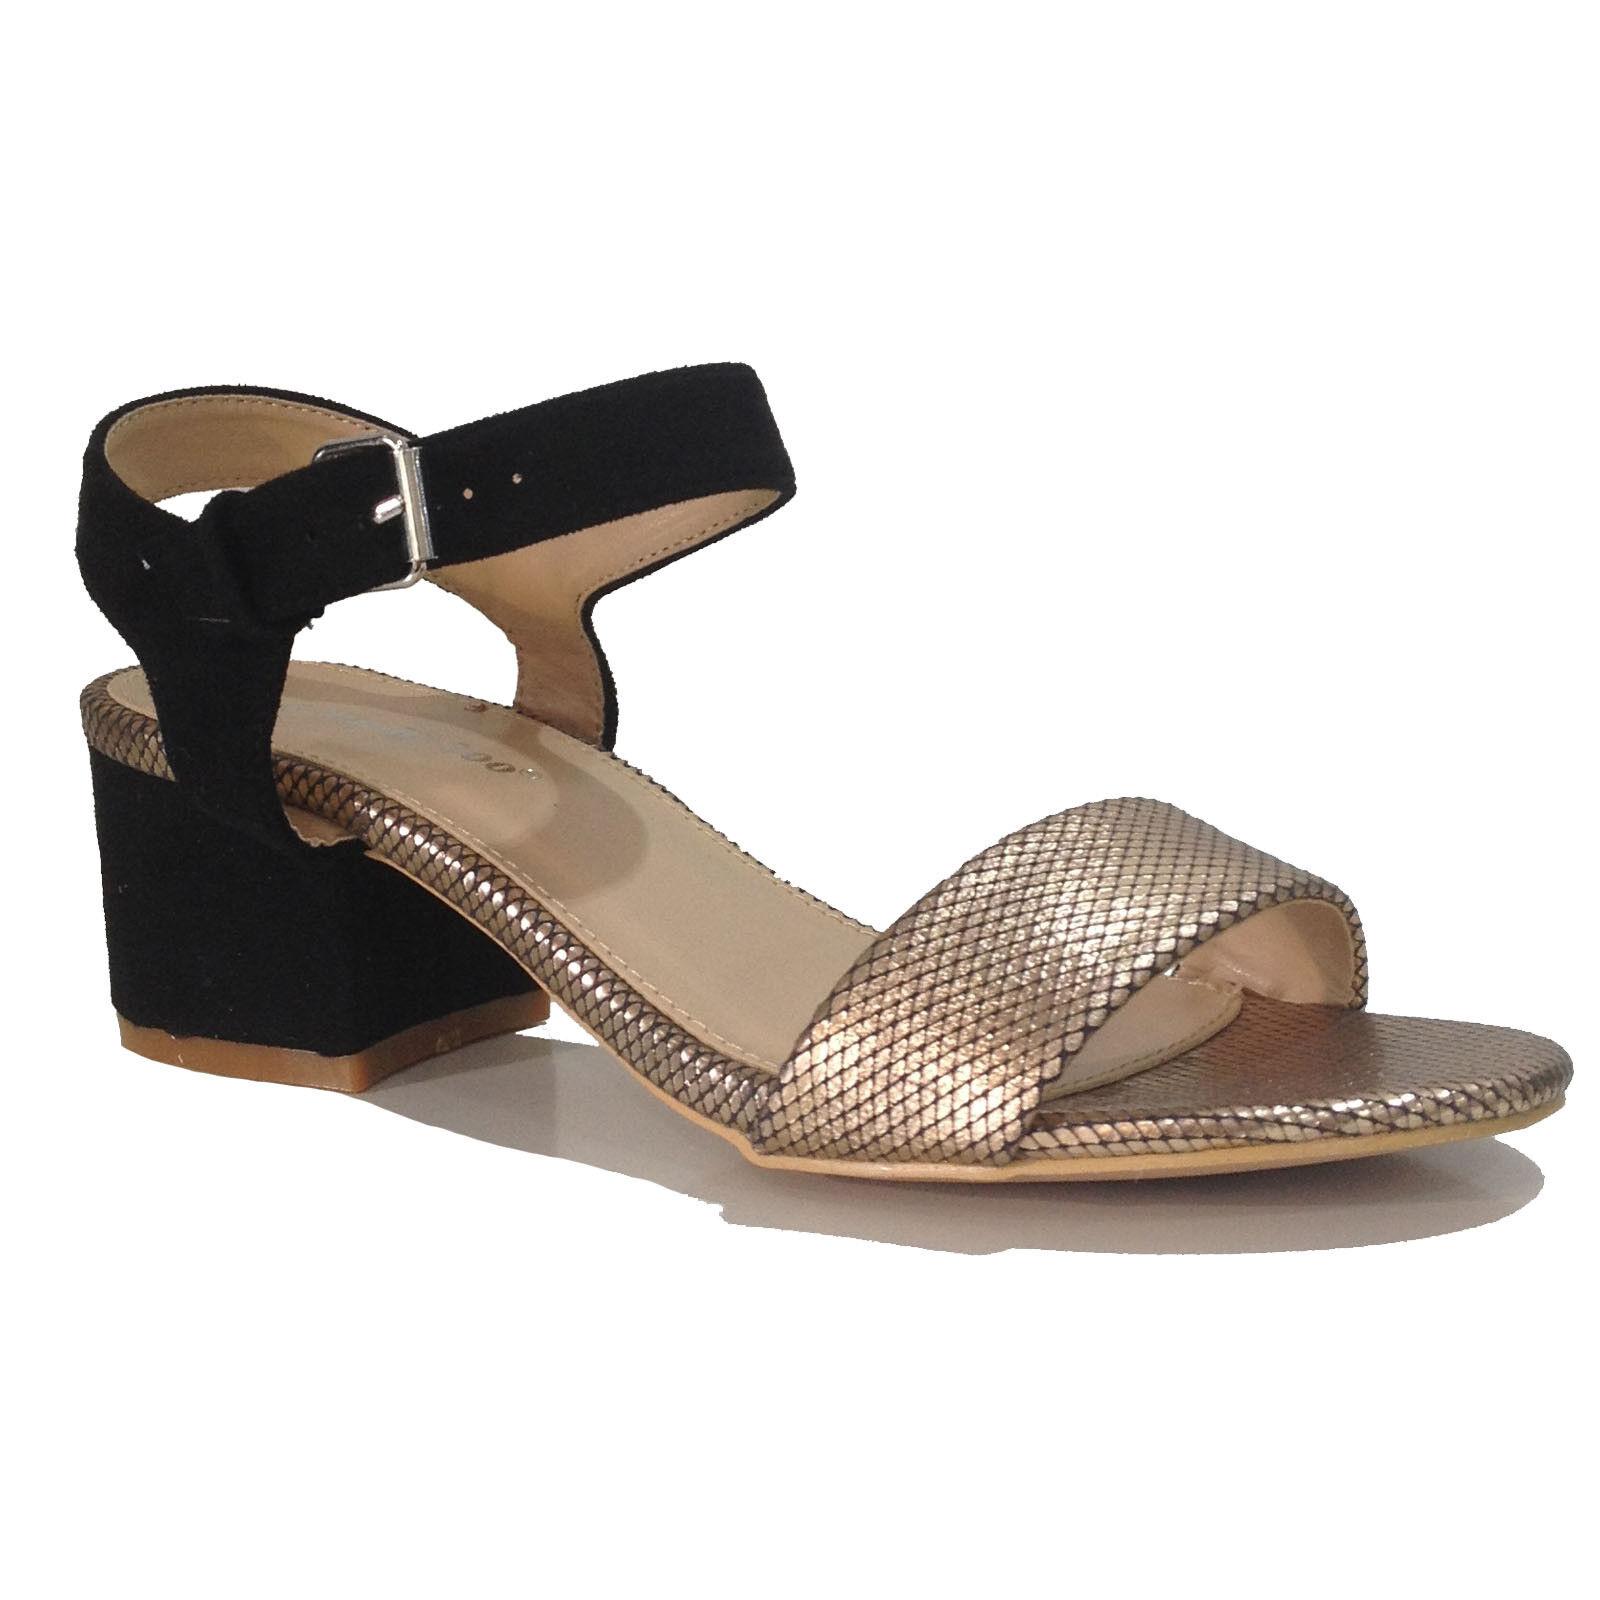 ☼ELEN☼ Sandales à talon - - - TRENDY TOO - Ref  0898  mejor marca